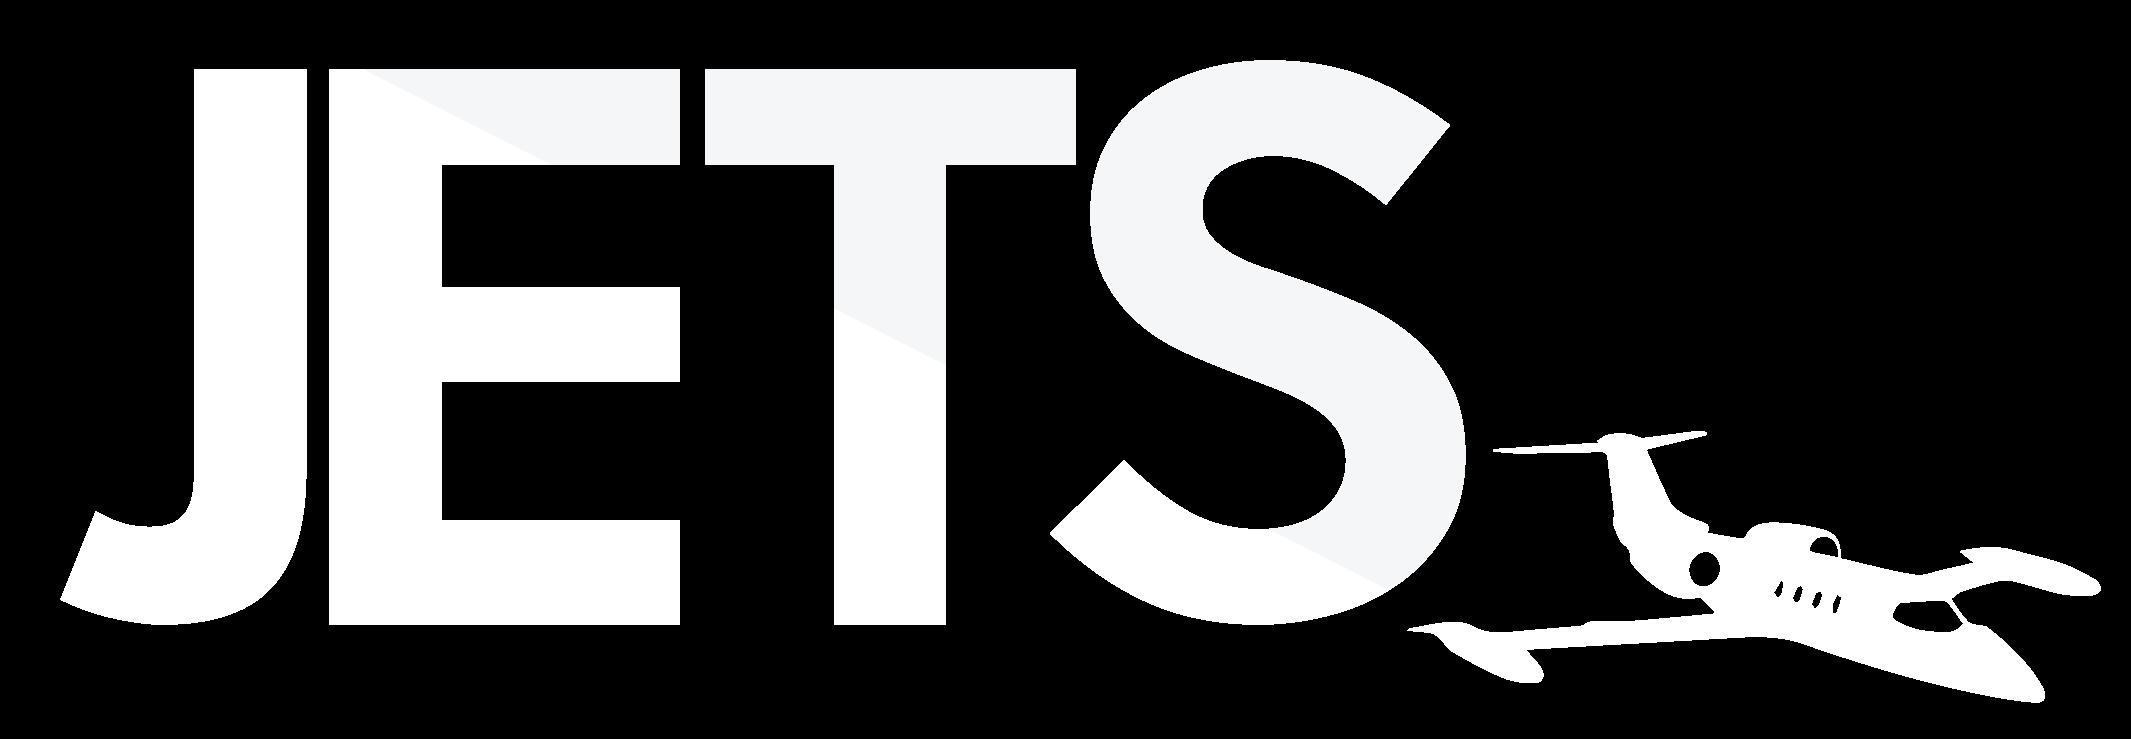 JETS | Jet Executive Turnaround Service